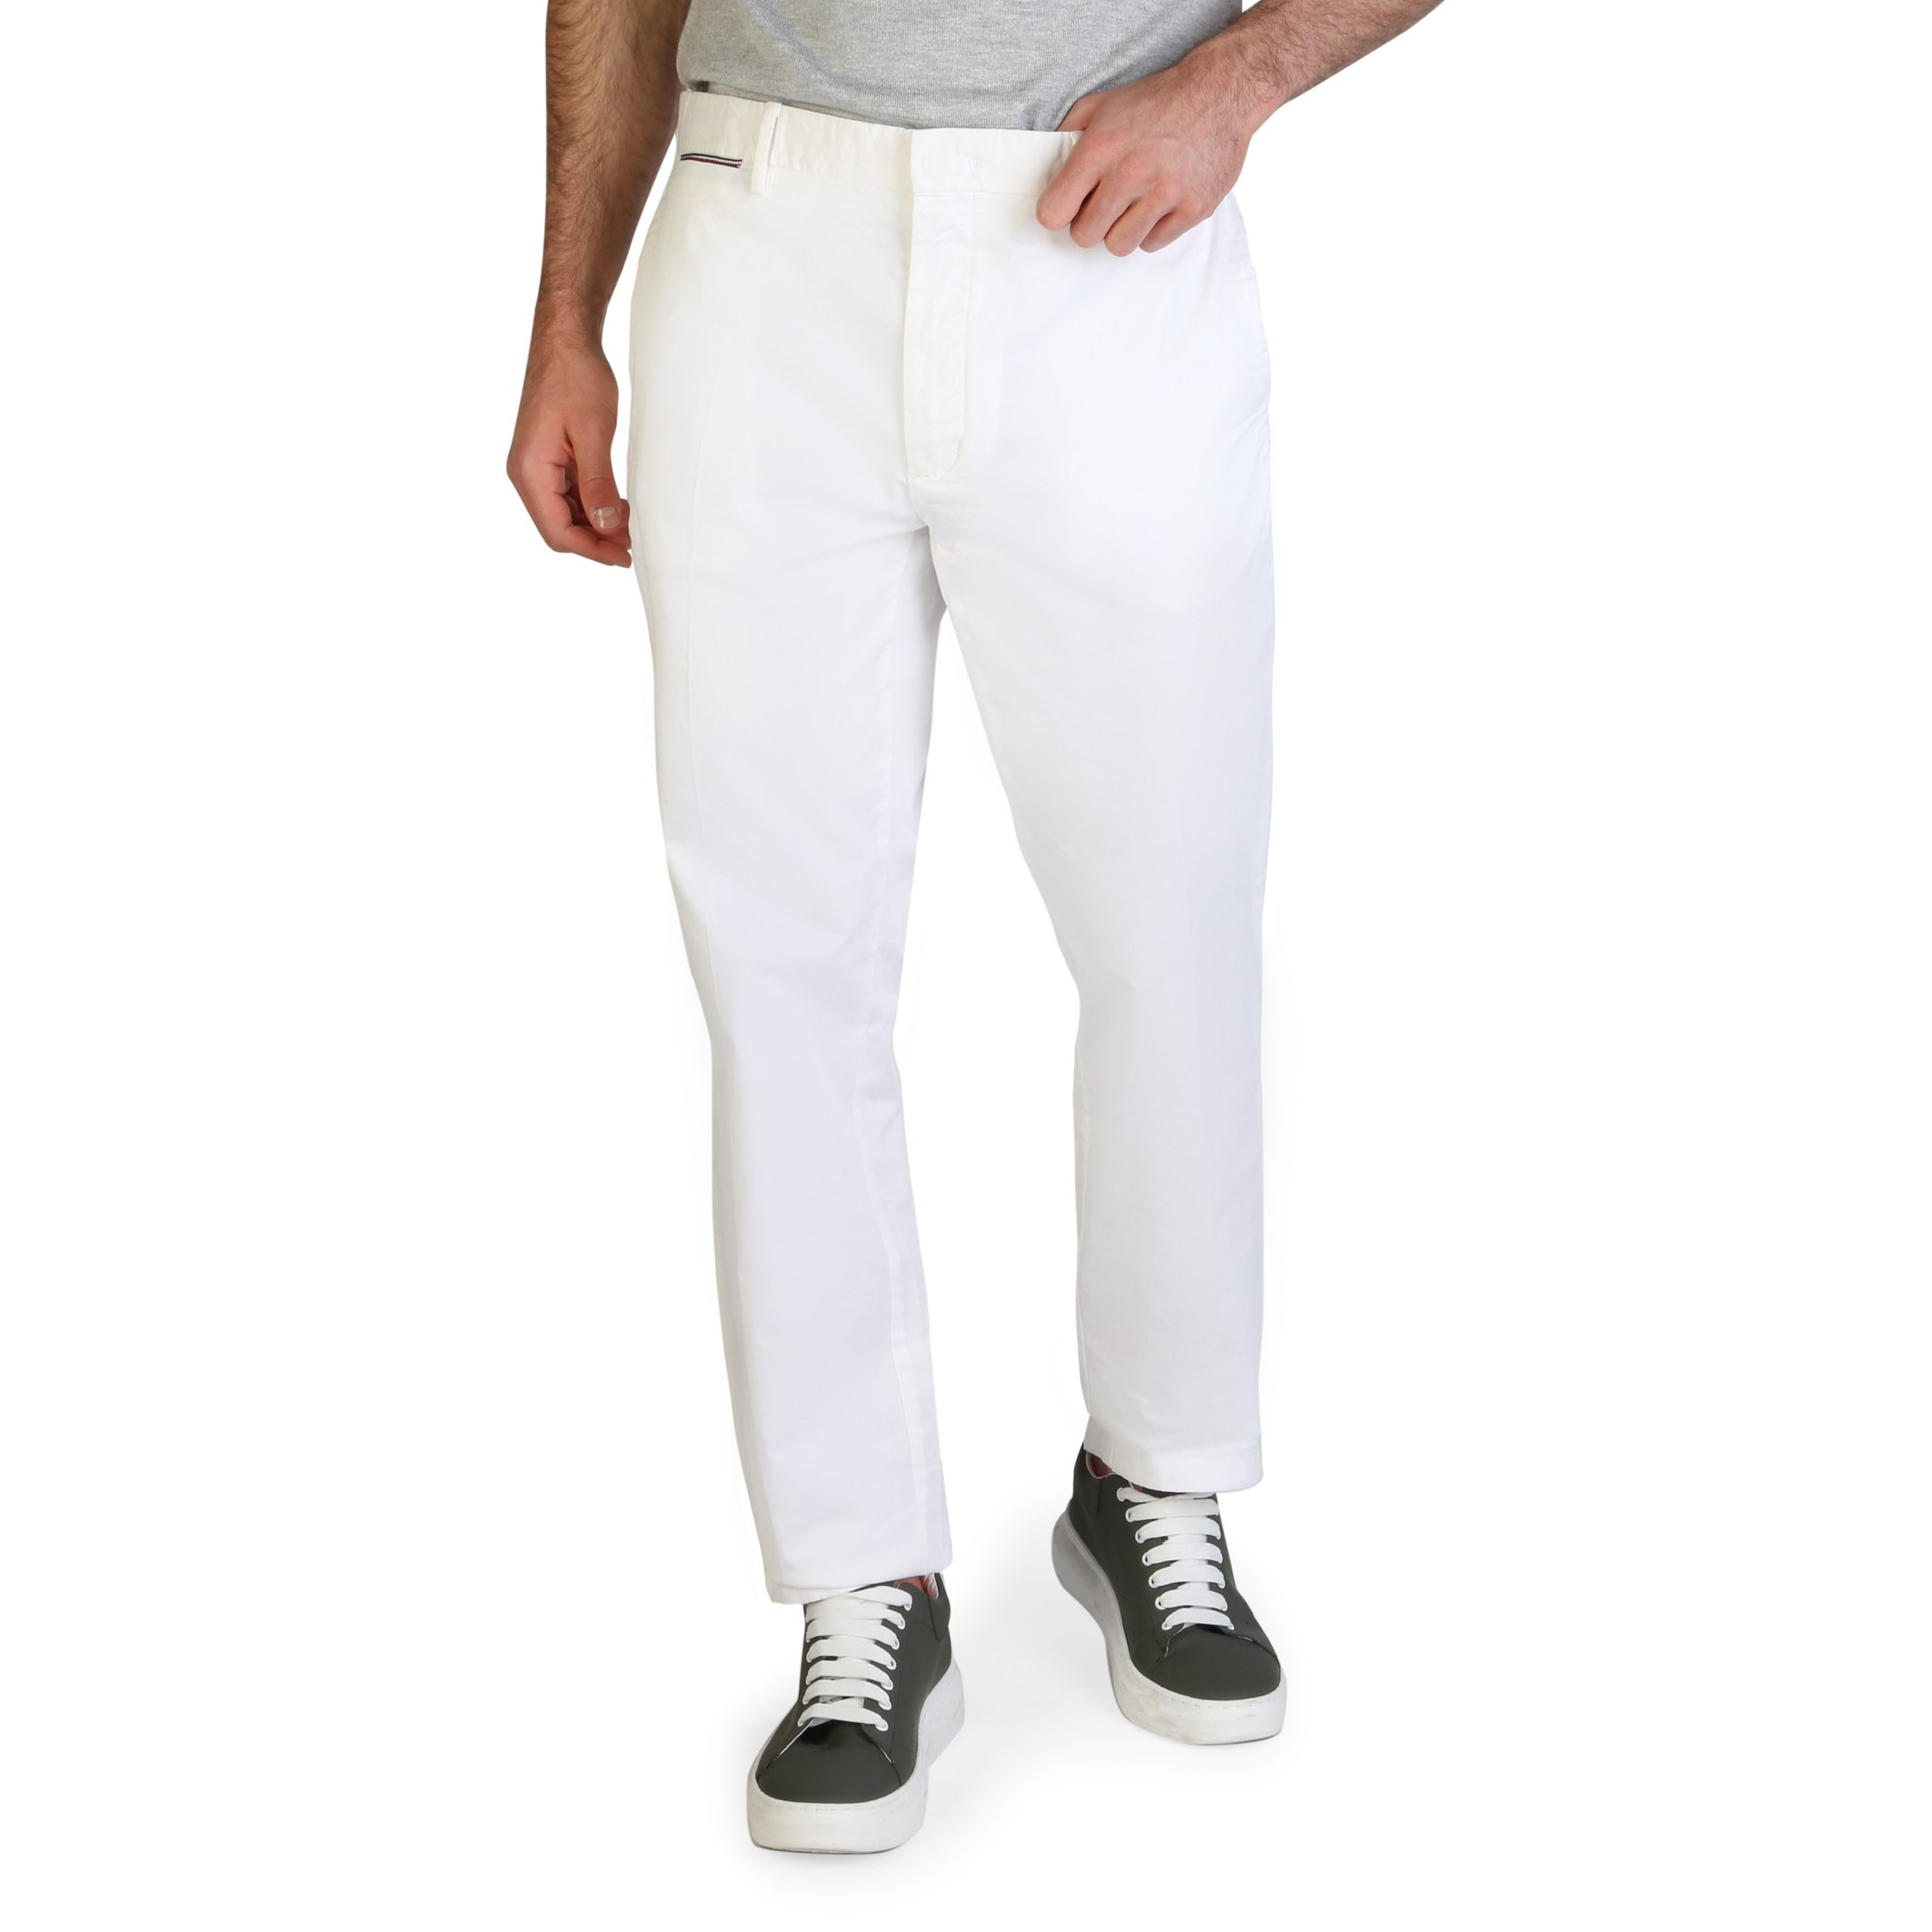 Tommy Hilfiger Men's Trouser Various Colours MW0MW13299 - white 30